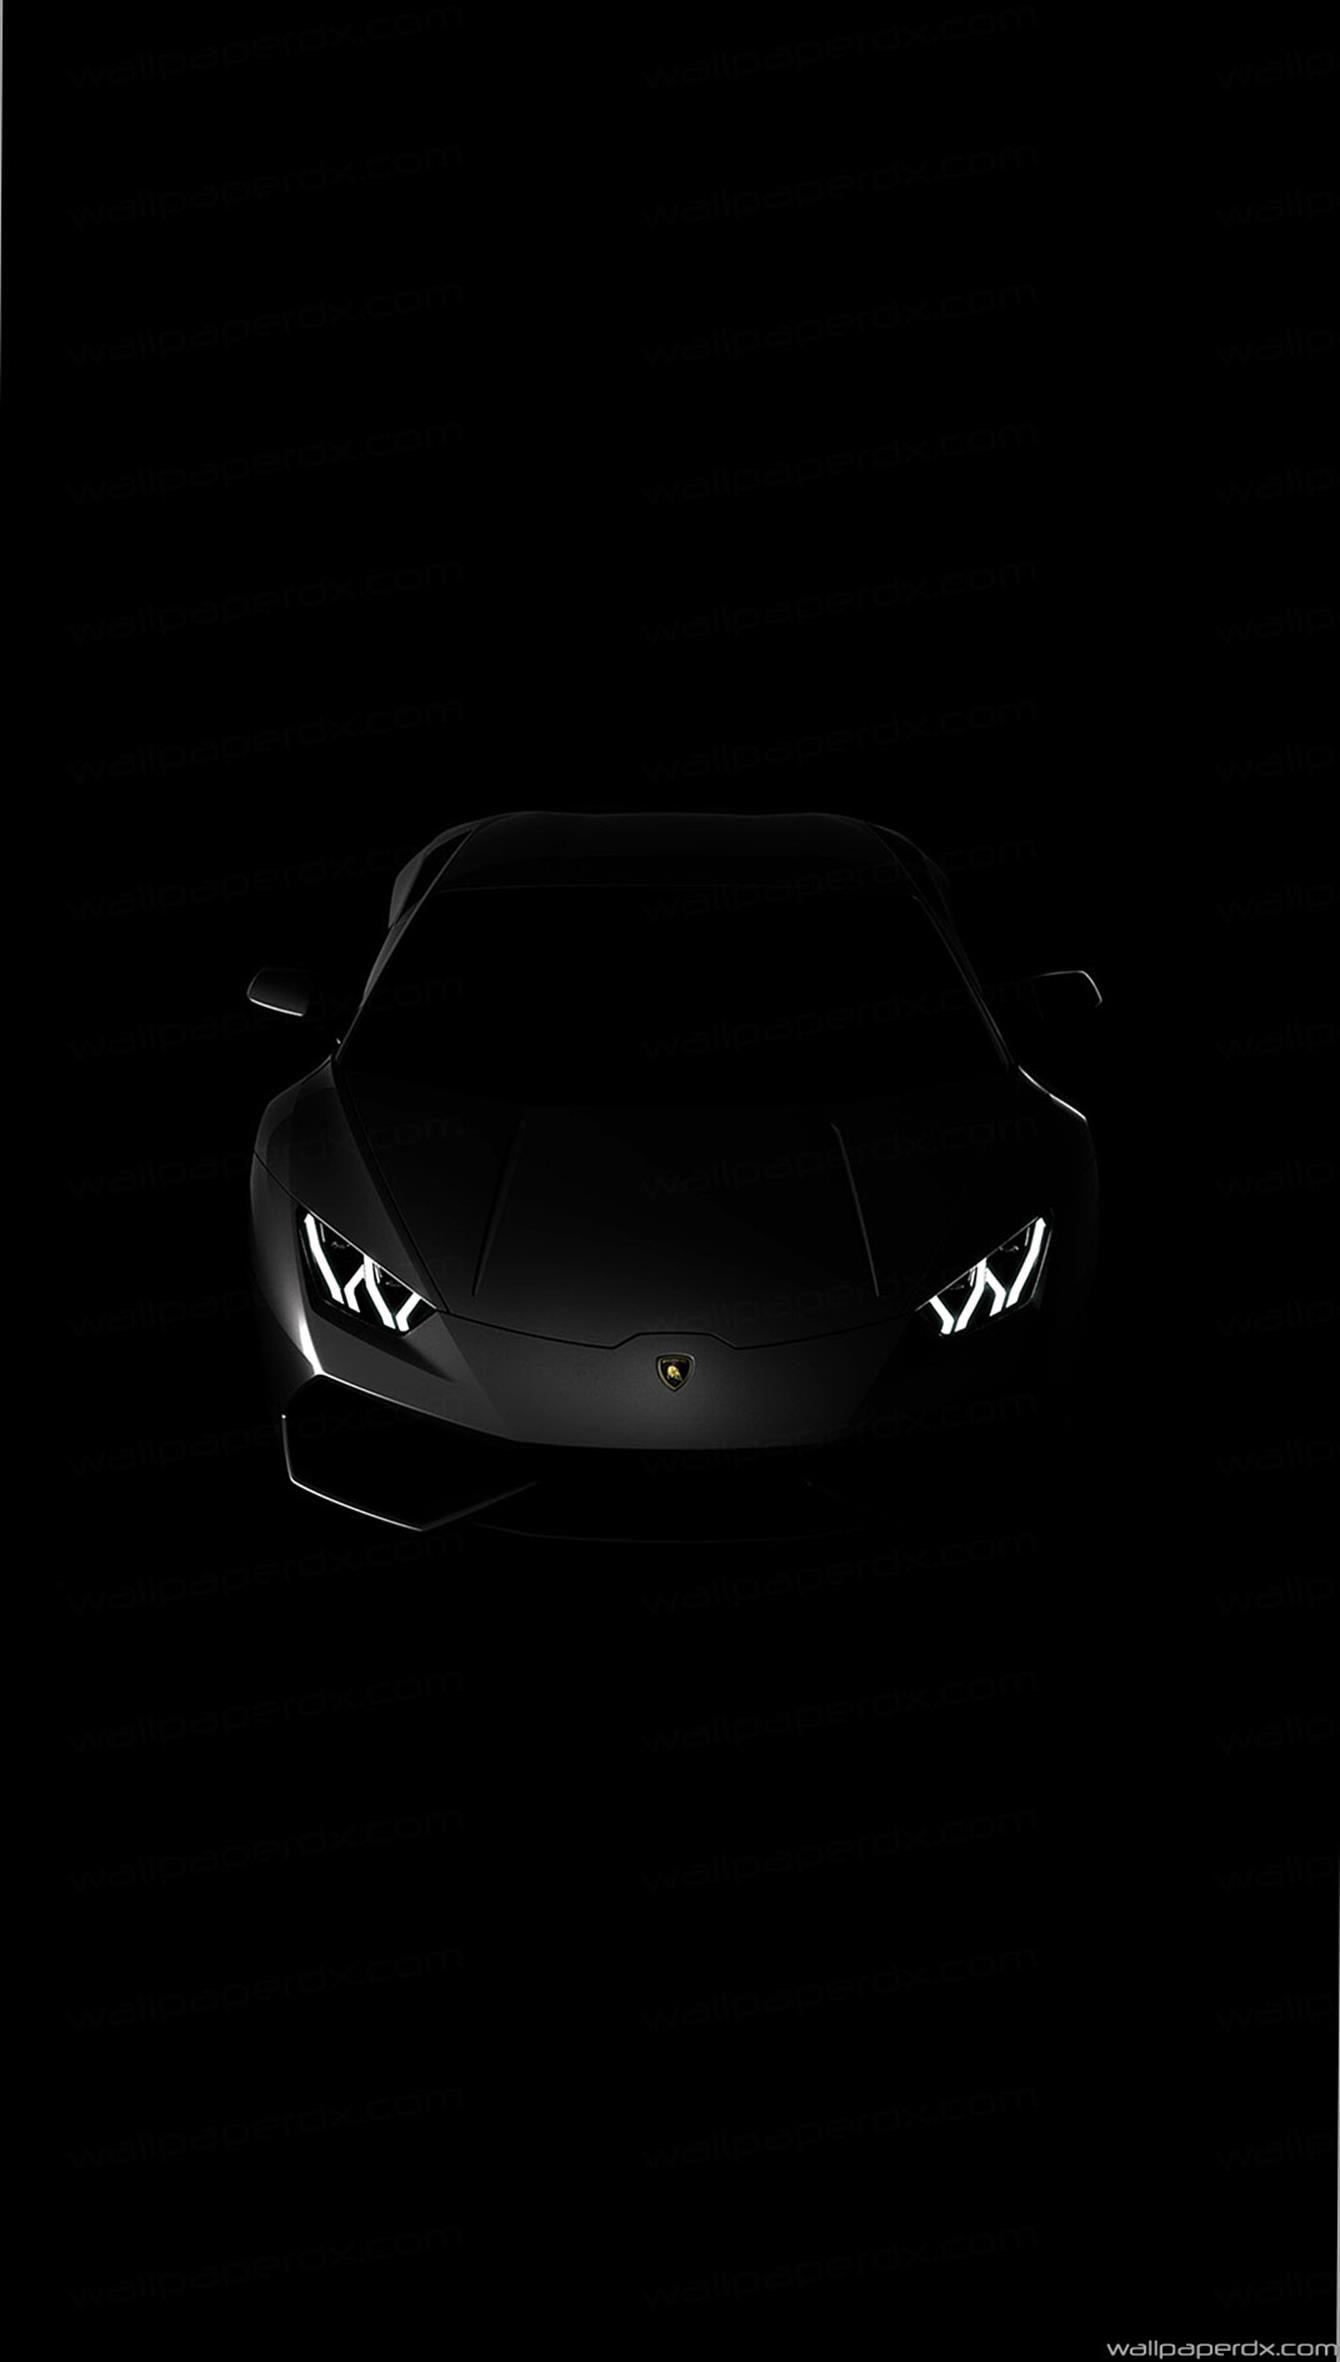 Lamborghini Huracan Matte Black 27 Jpg 1 340 2 362 Pixels Lamborghini Huracan Lamborghini Matte Black Cars